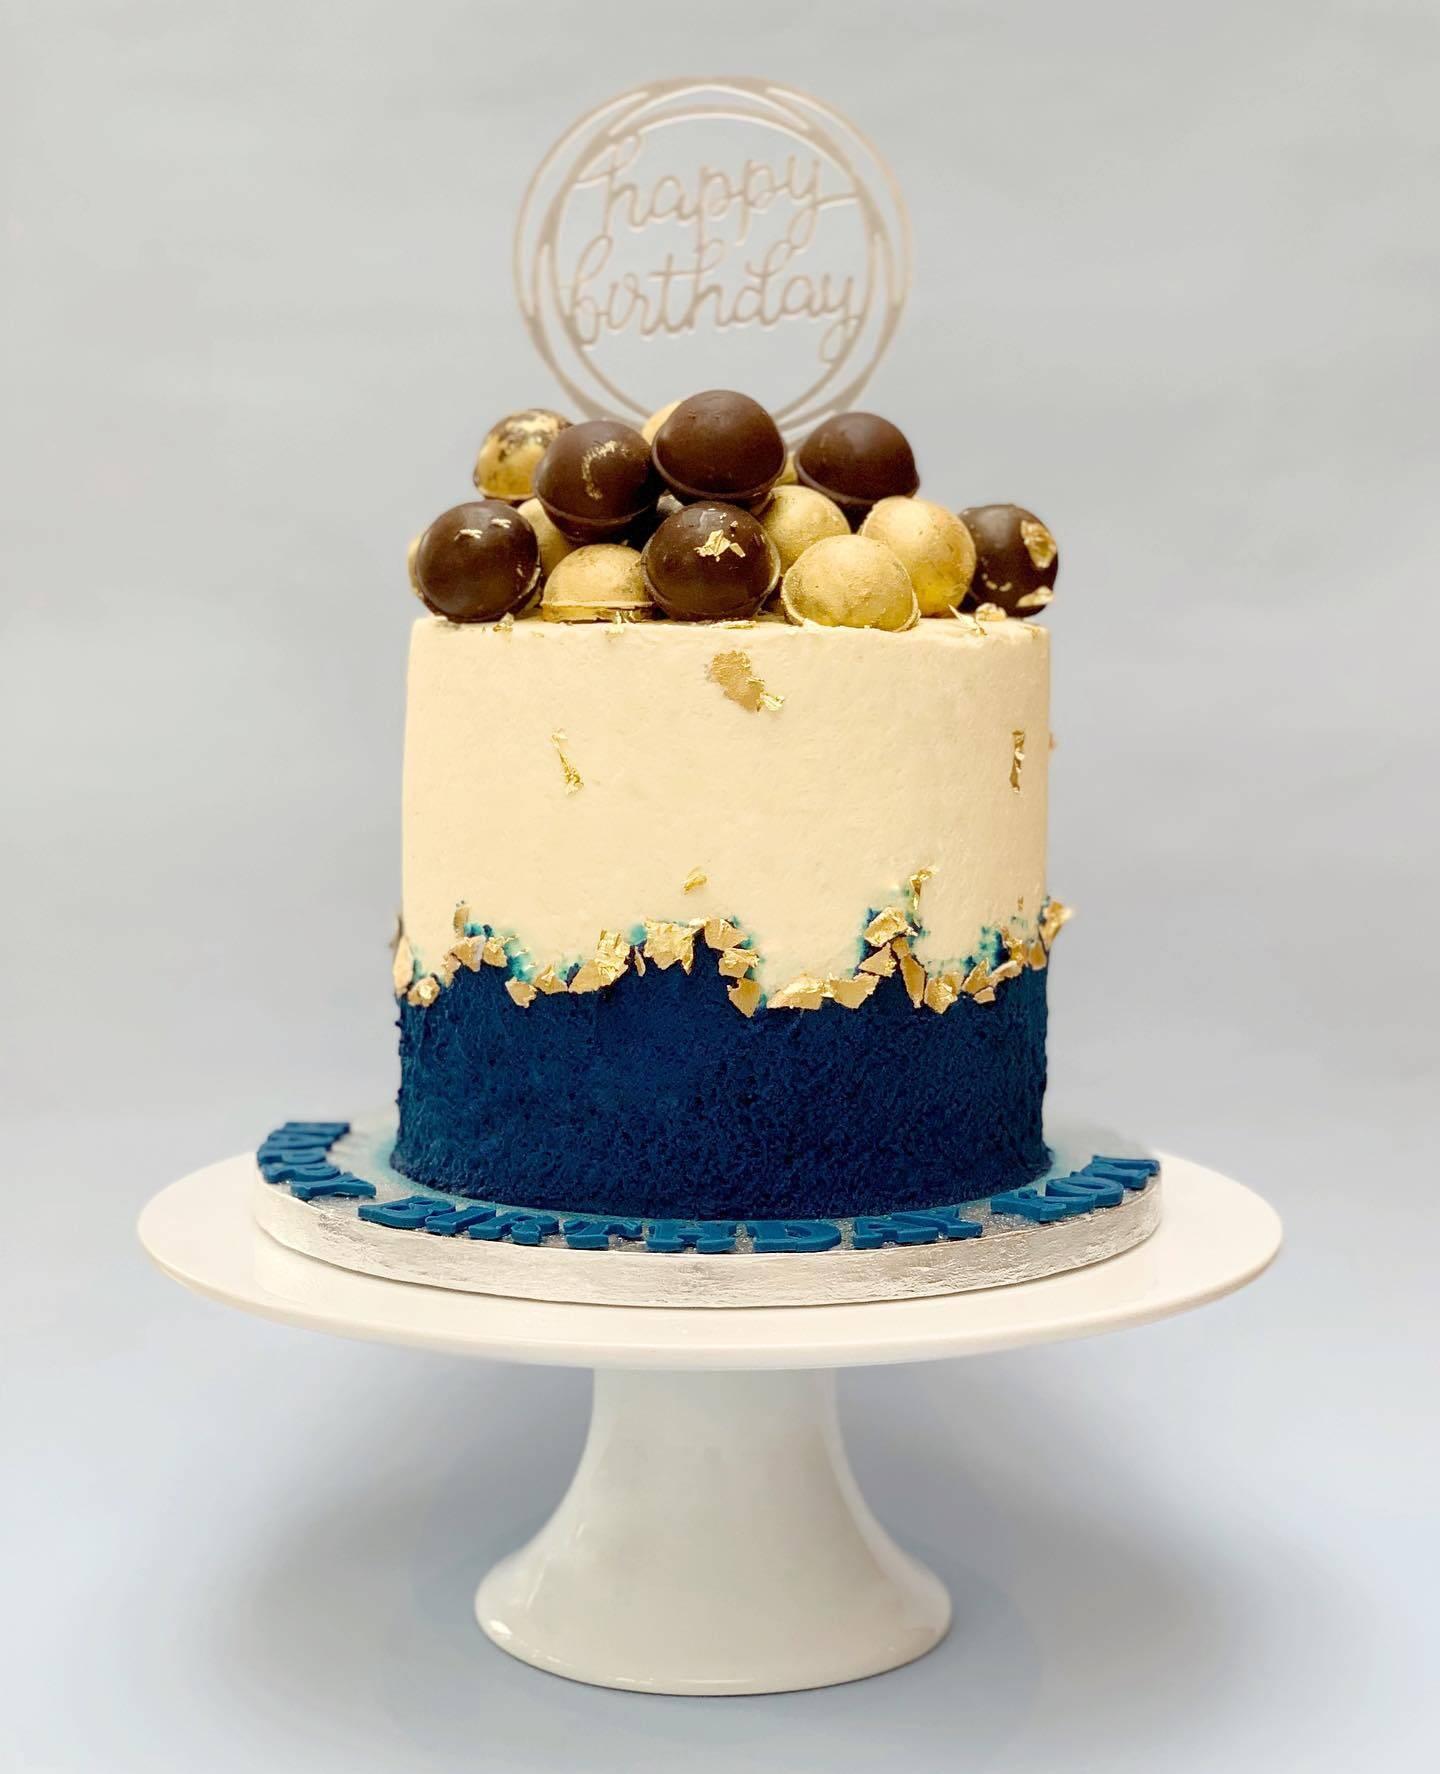 Fresh Cream Cake with Chocolates on Top